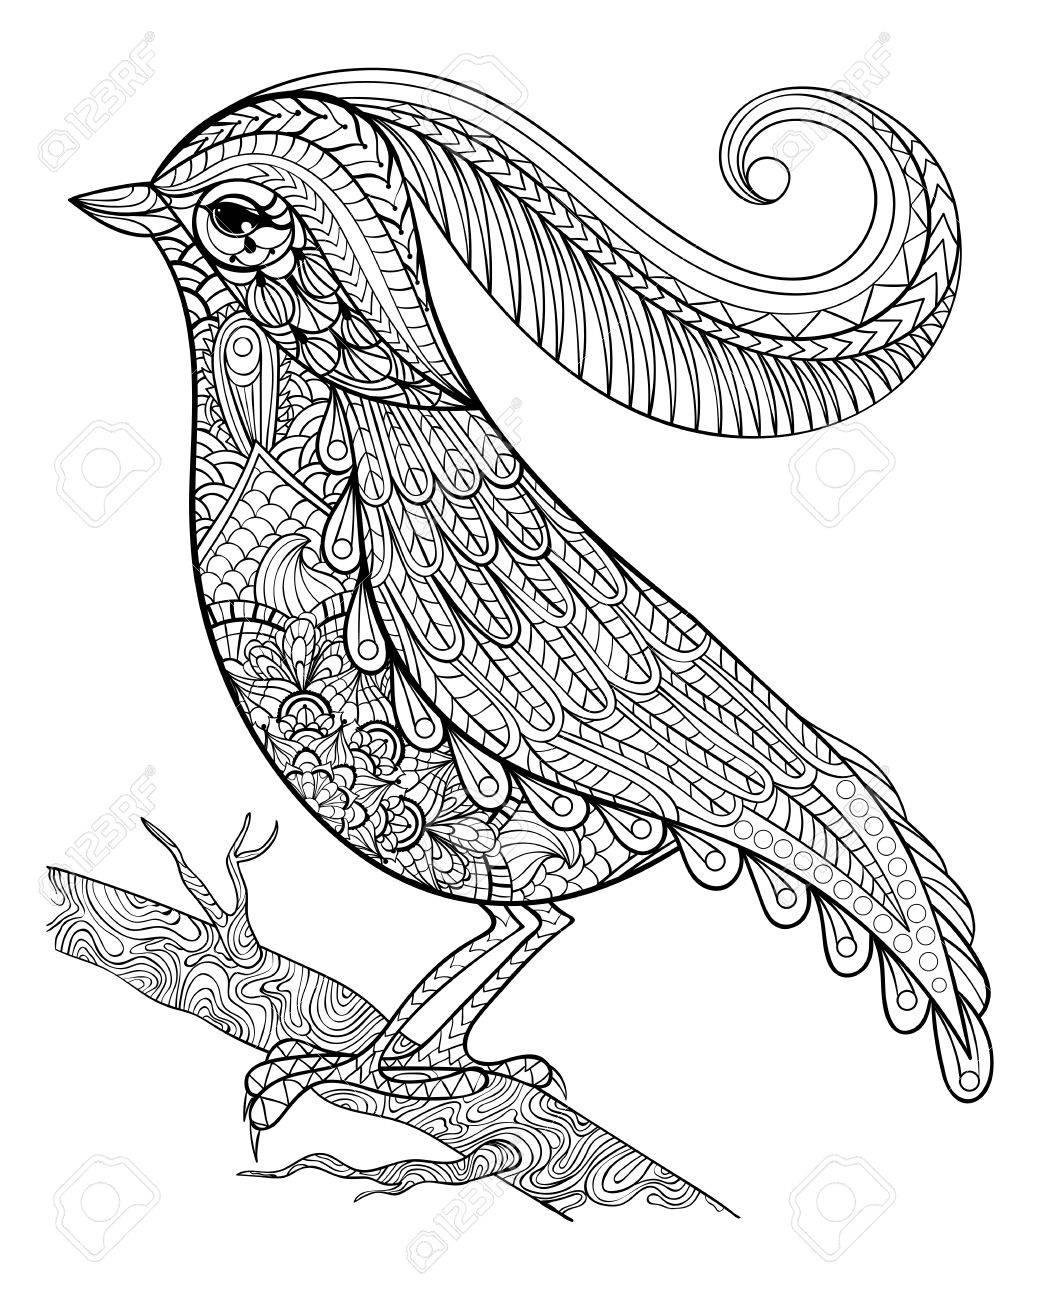 1040x1300 Hand Drawnbeautiful Delicate Bird Sitting On A Branch Framed